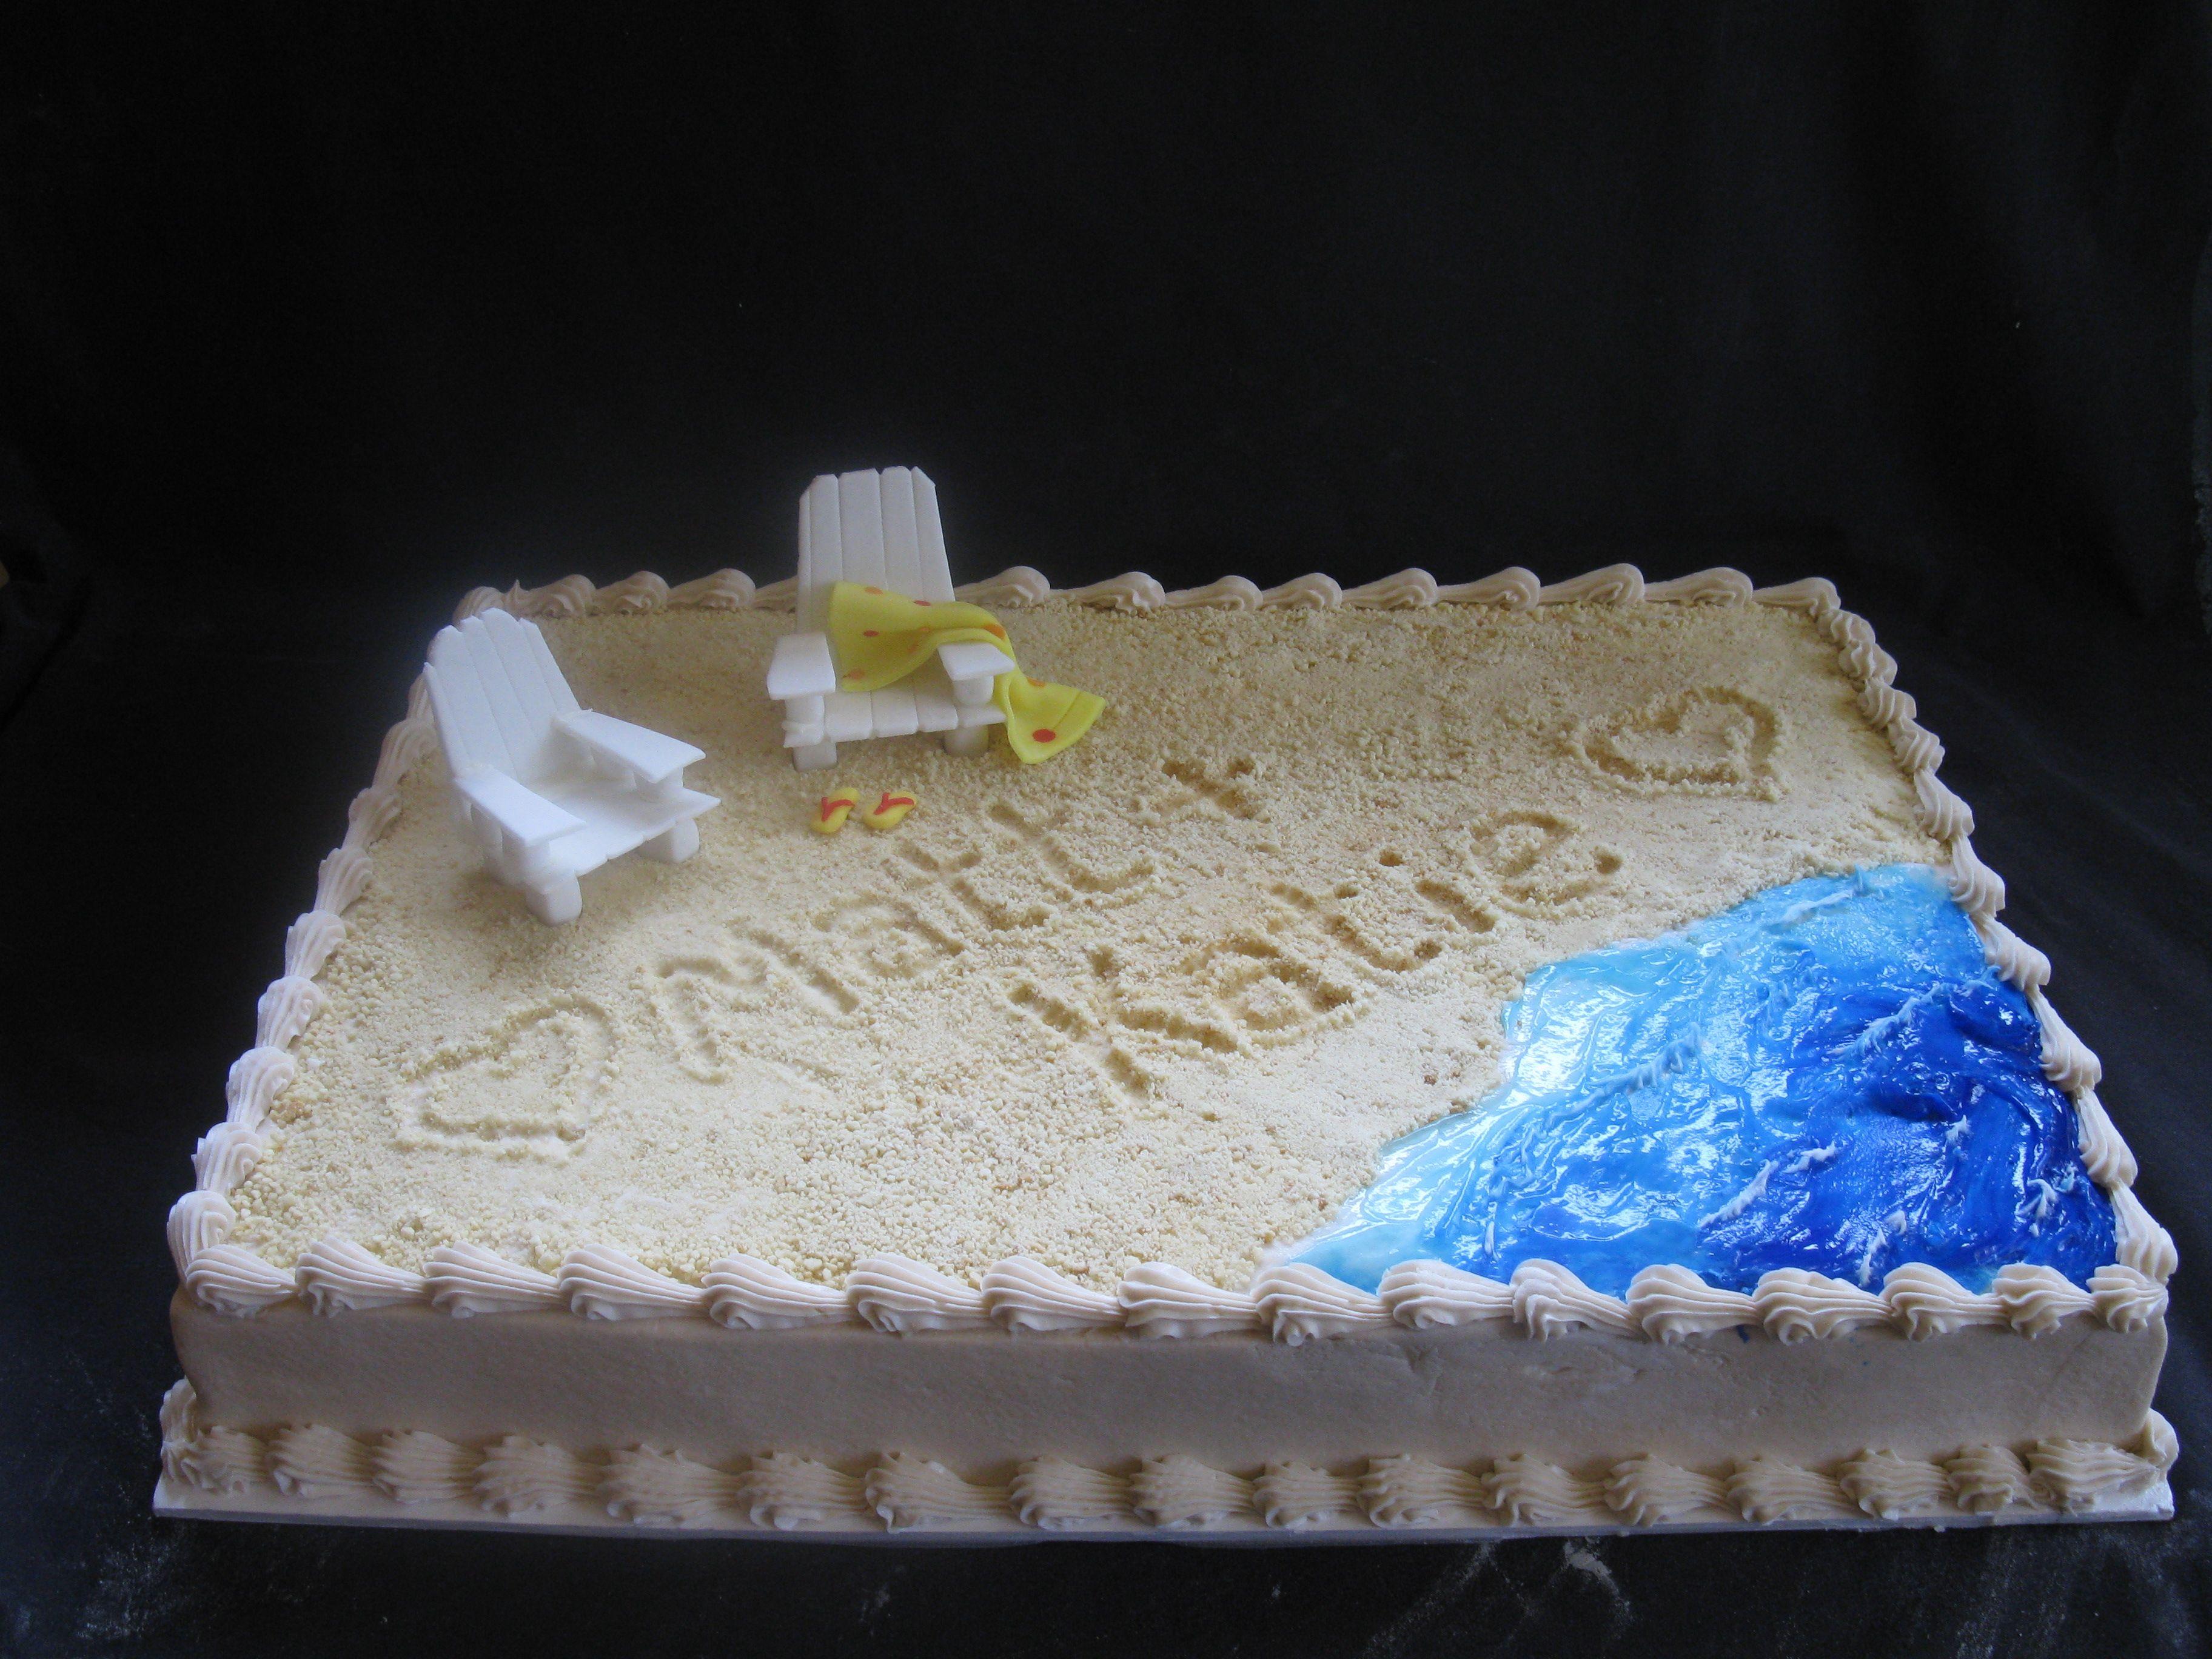 Cool Wedding Cake Frosting Thin Wedding Cakes Near Me Shaped Wedding Cake Design Ideas Glass Wedding Cake Toppers Youthful Harley Davidson Wedding Cakes RedCake Stands For Wedding Cakes 640 Best Sheet Cakes Images On Pinterest | Cakes, Decorated Cakes ..